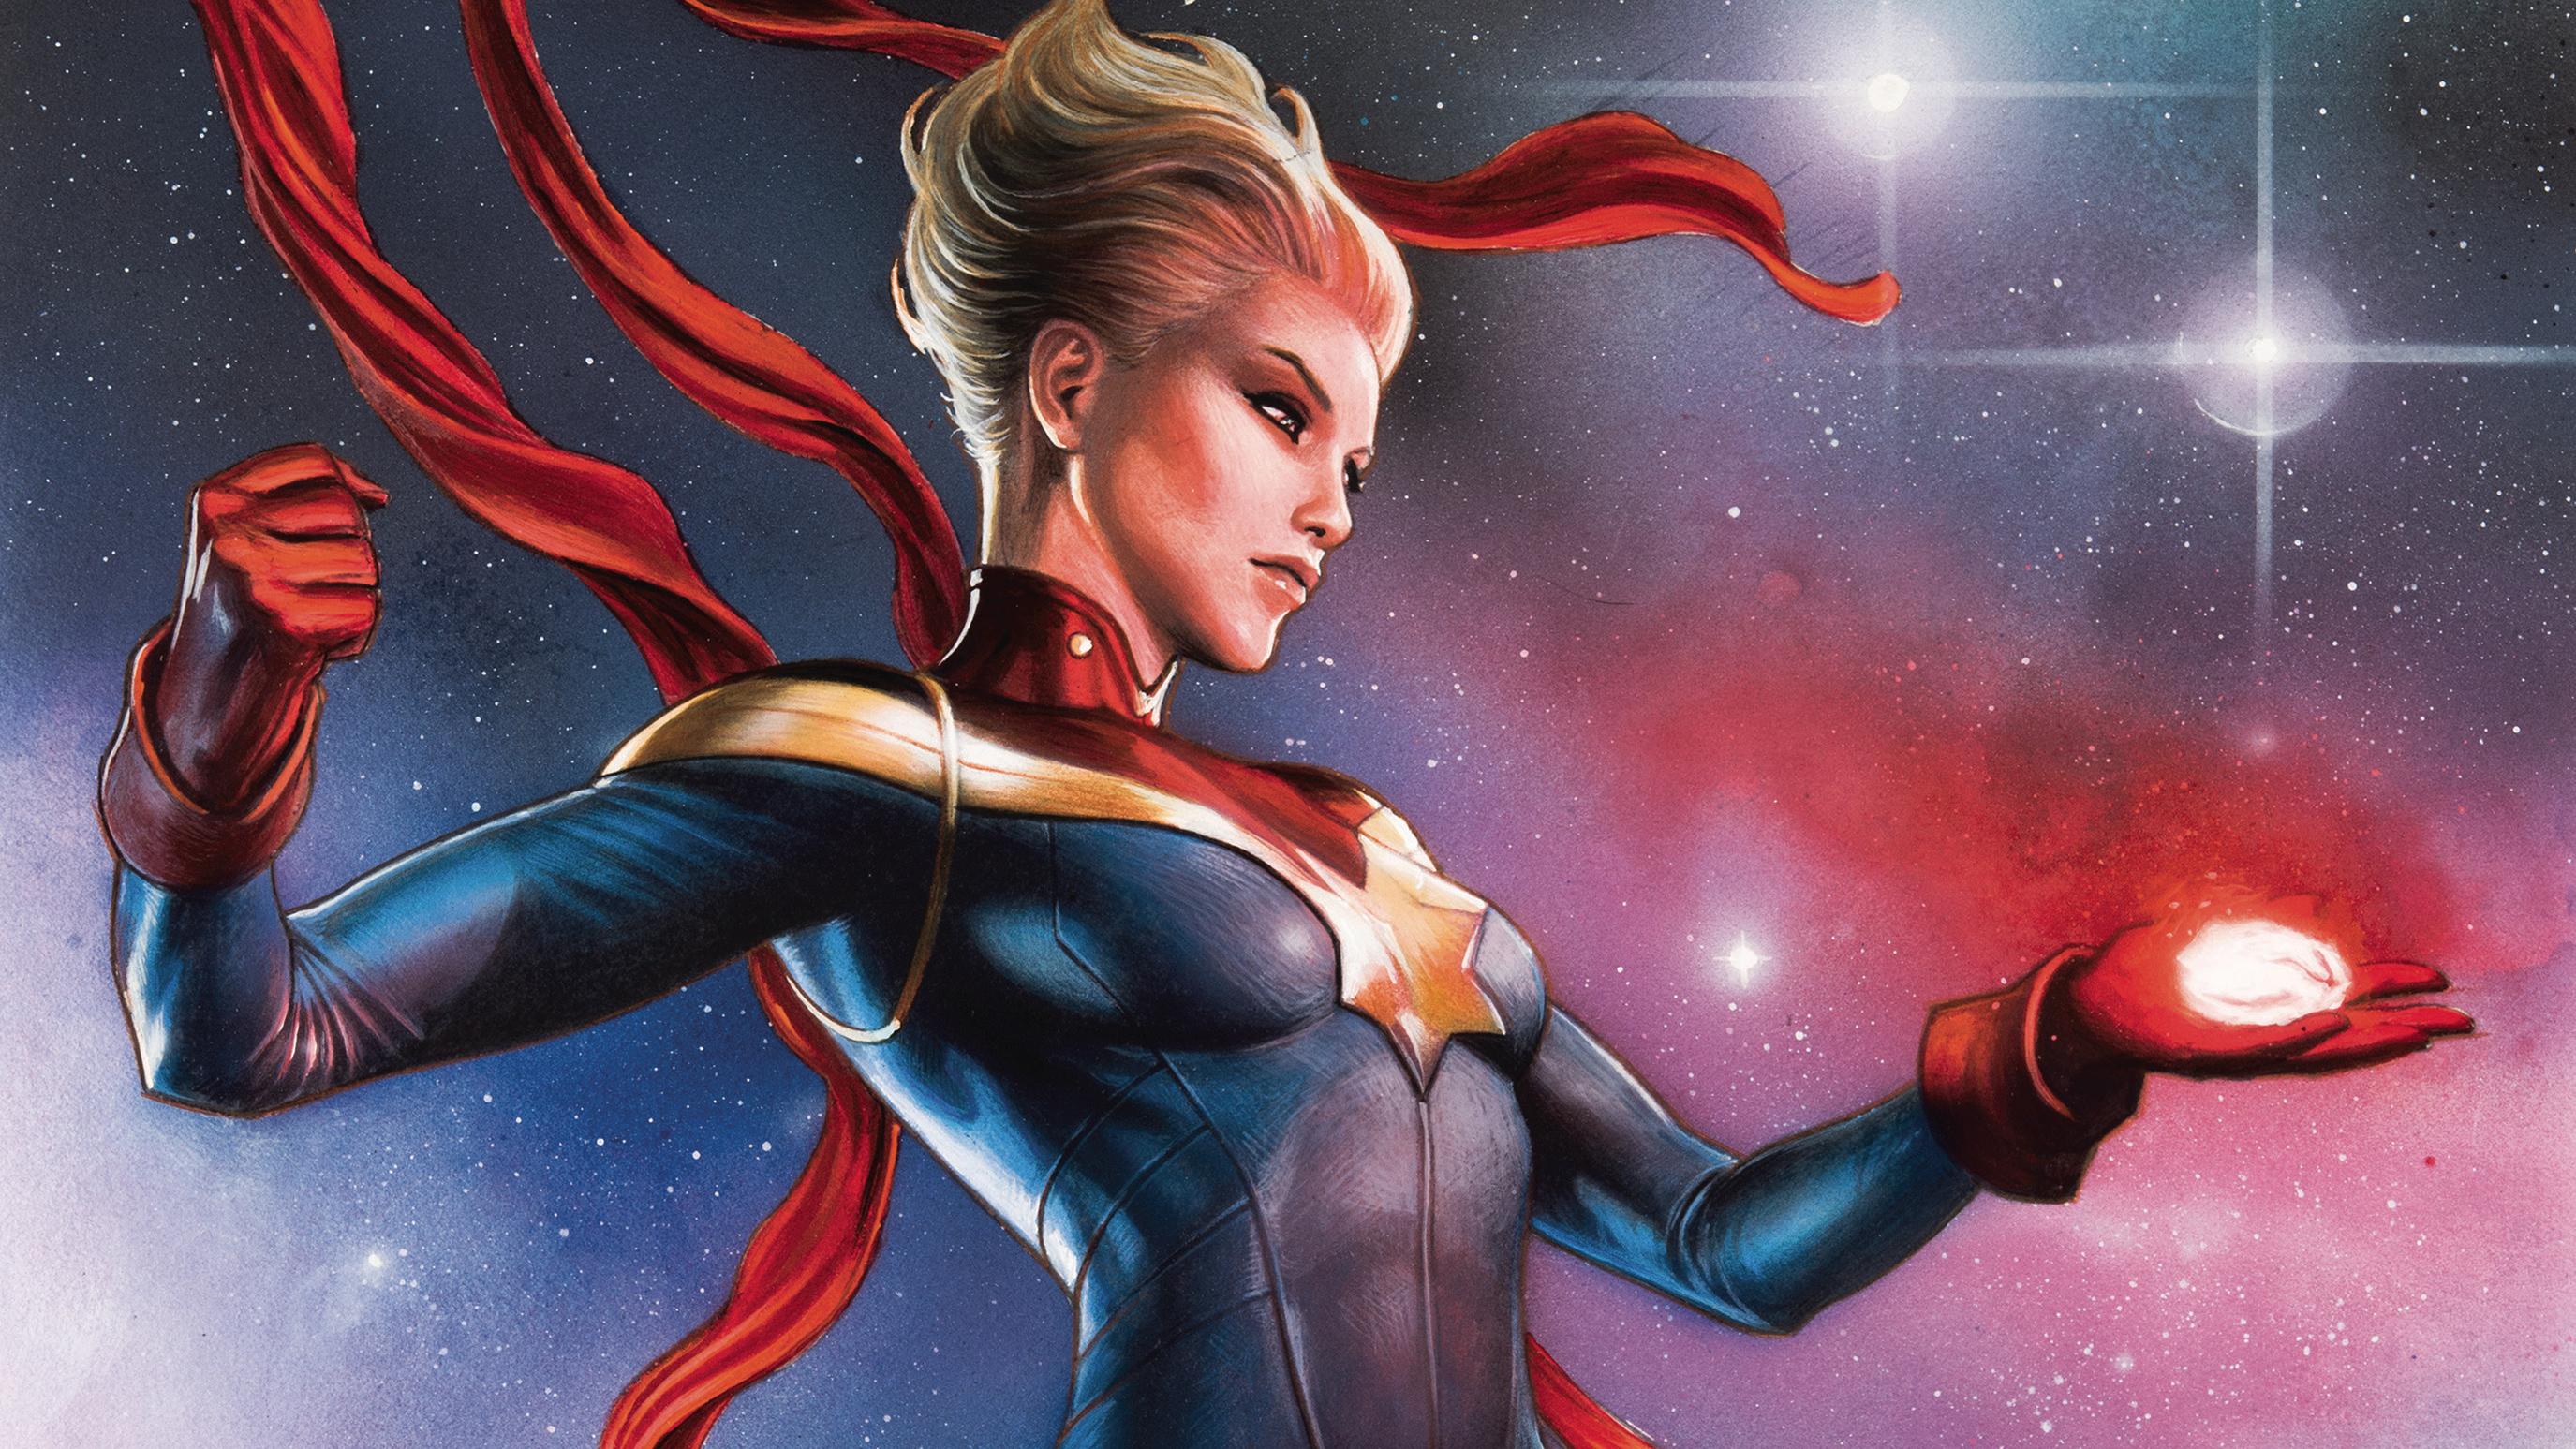 Captain Marvel Fantasy Art Wallpapers Hd Desktop And: Captain Marvel Fondo De Pantalla HD